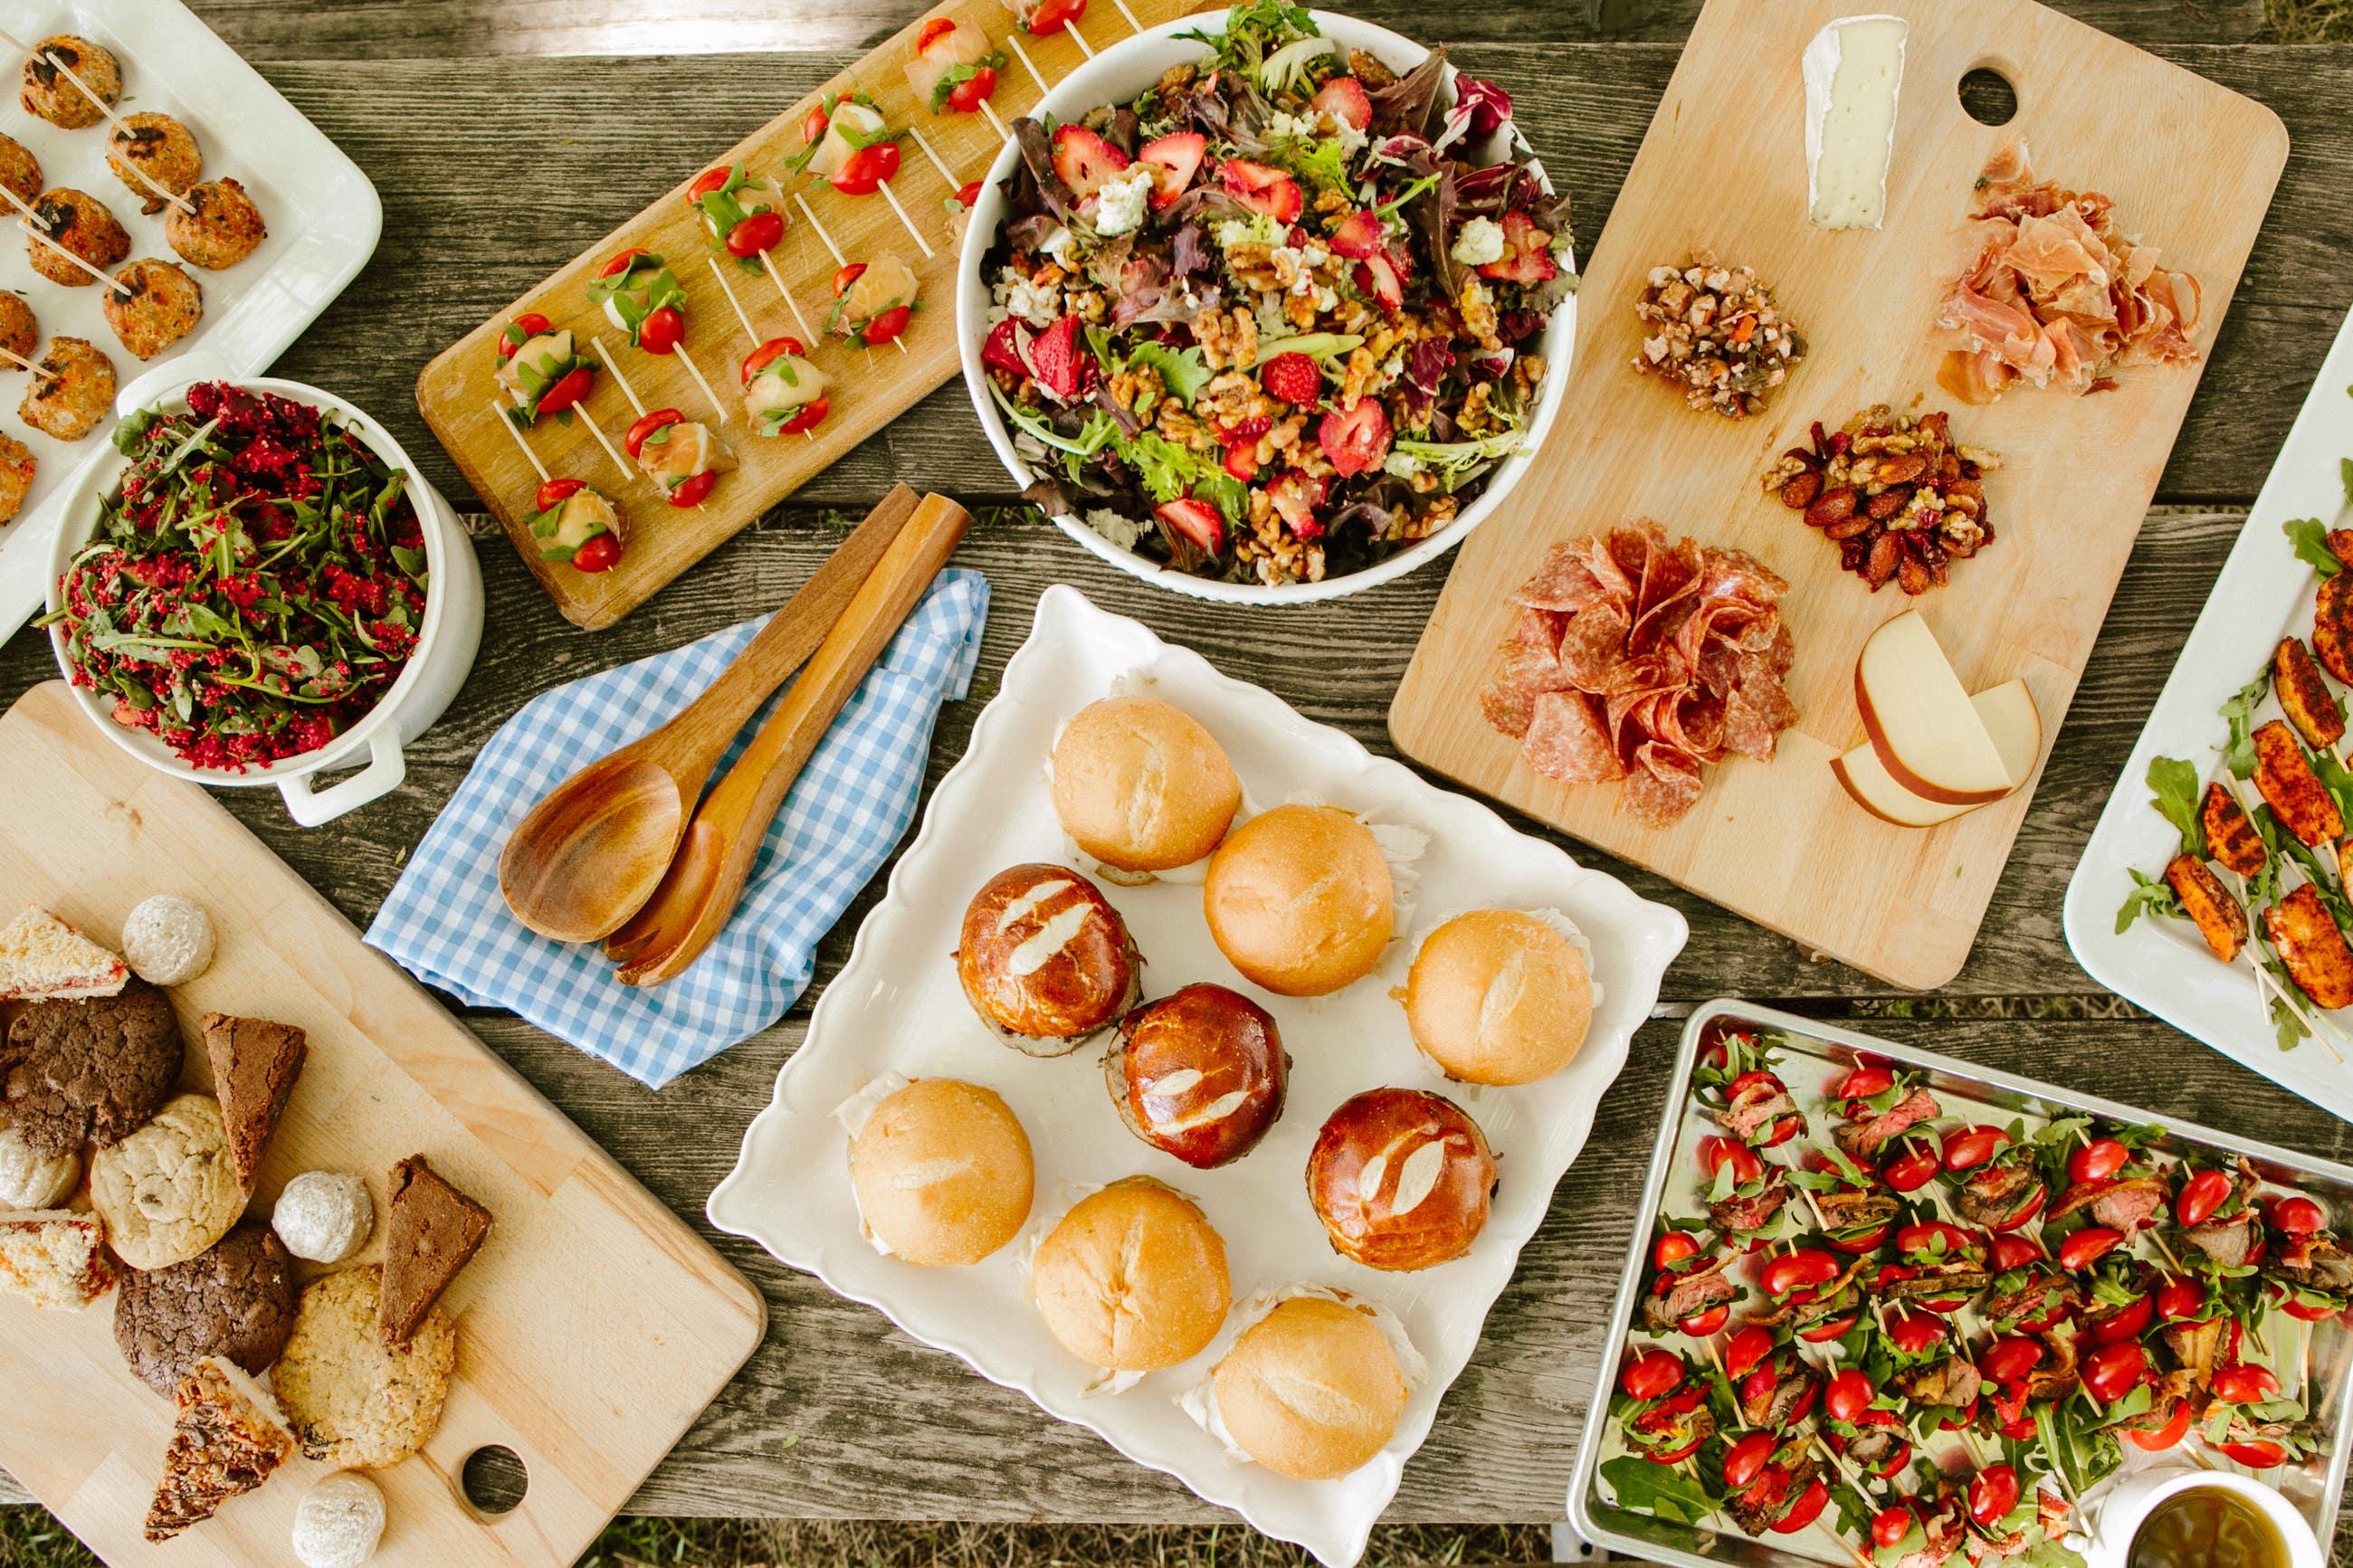 Mendocino Farms Social Catering Picnic